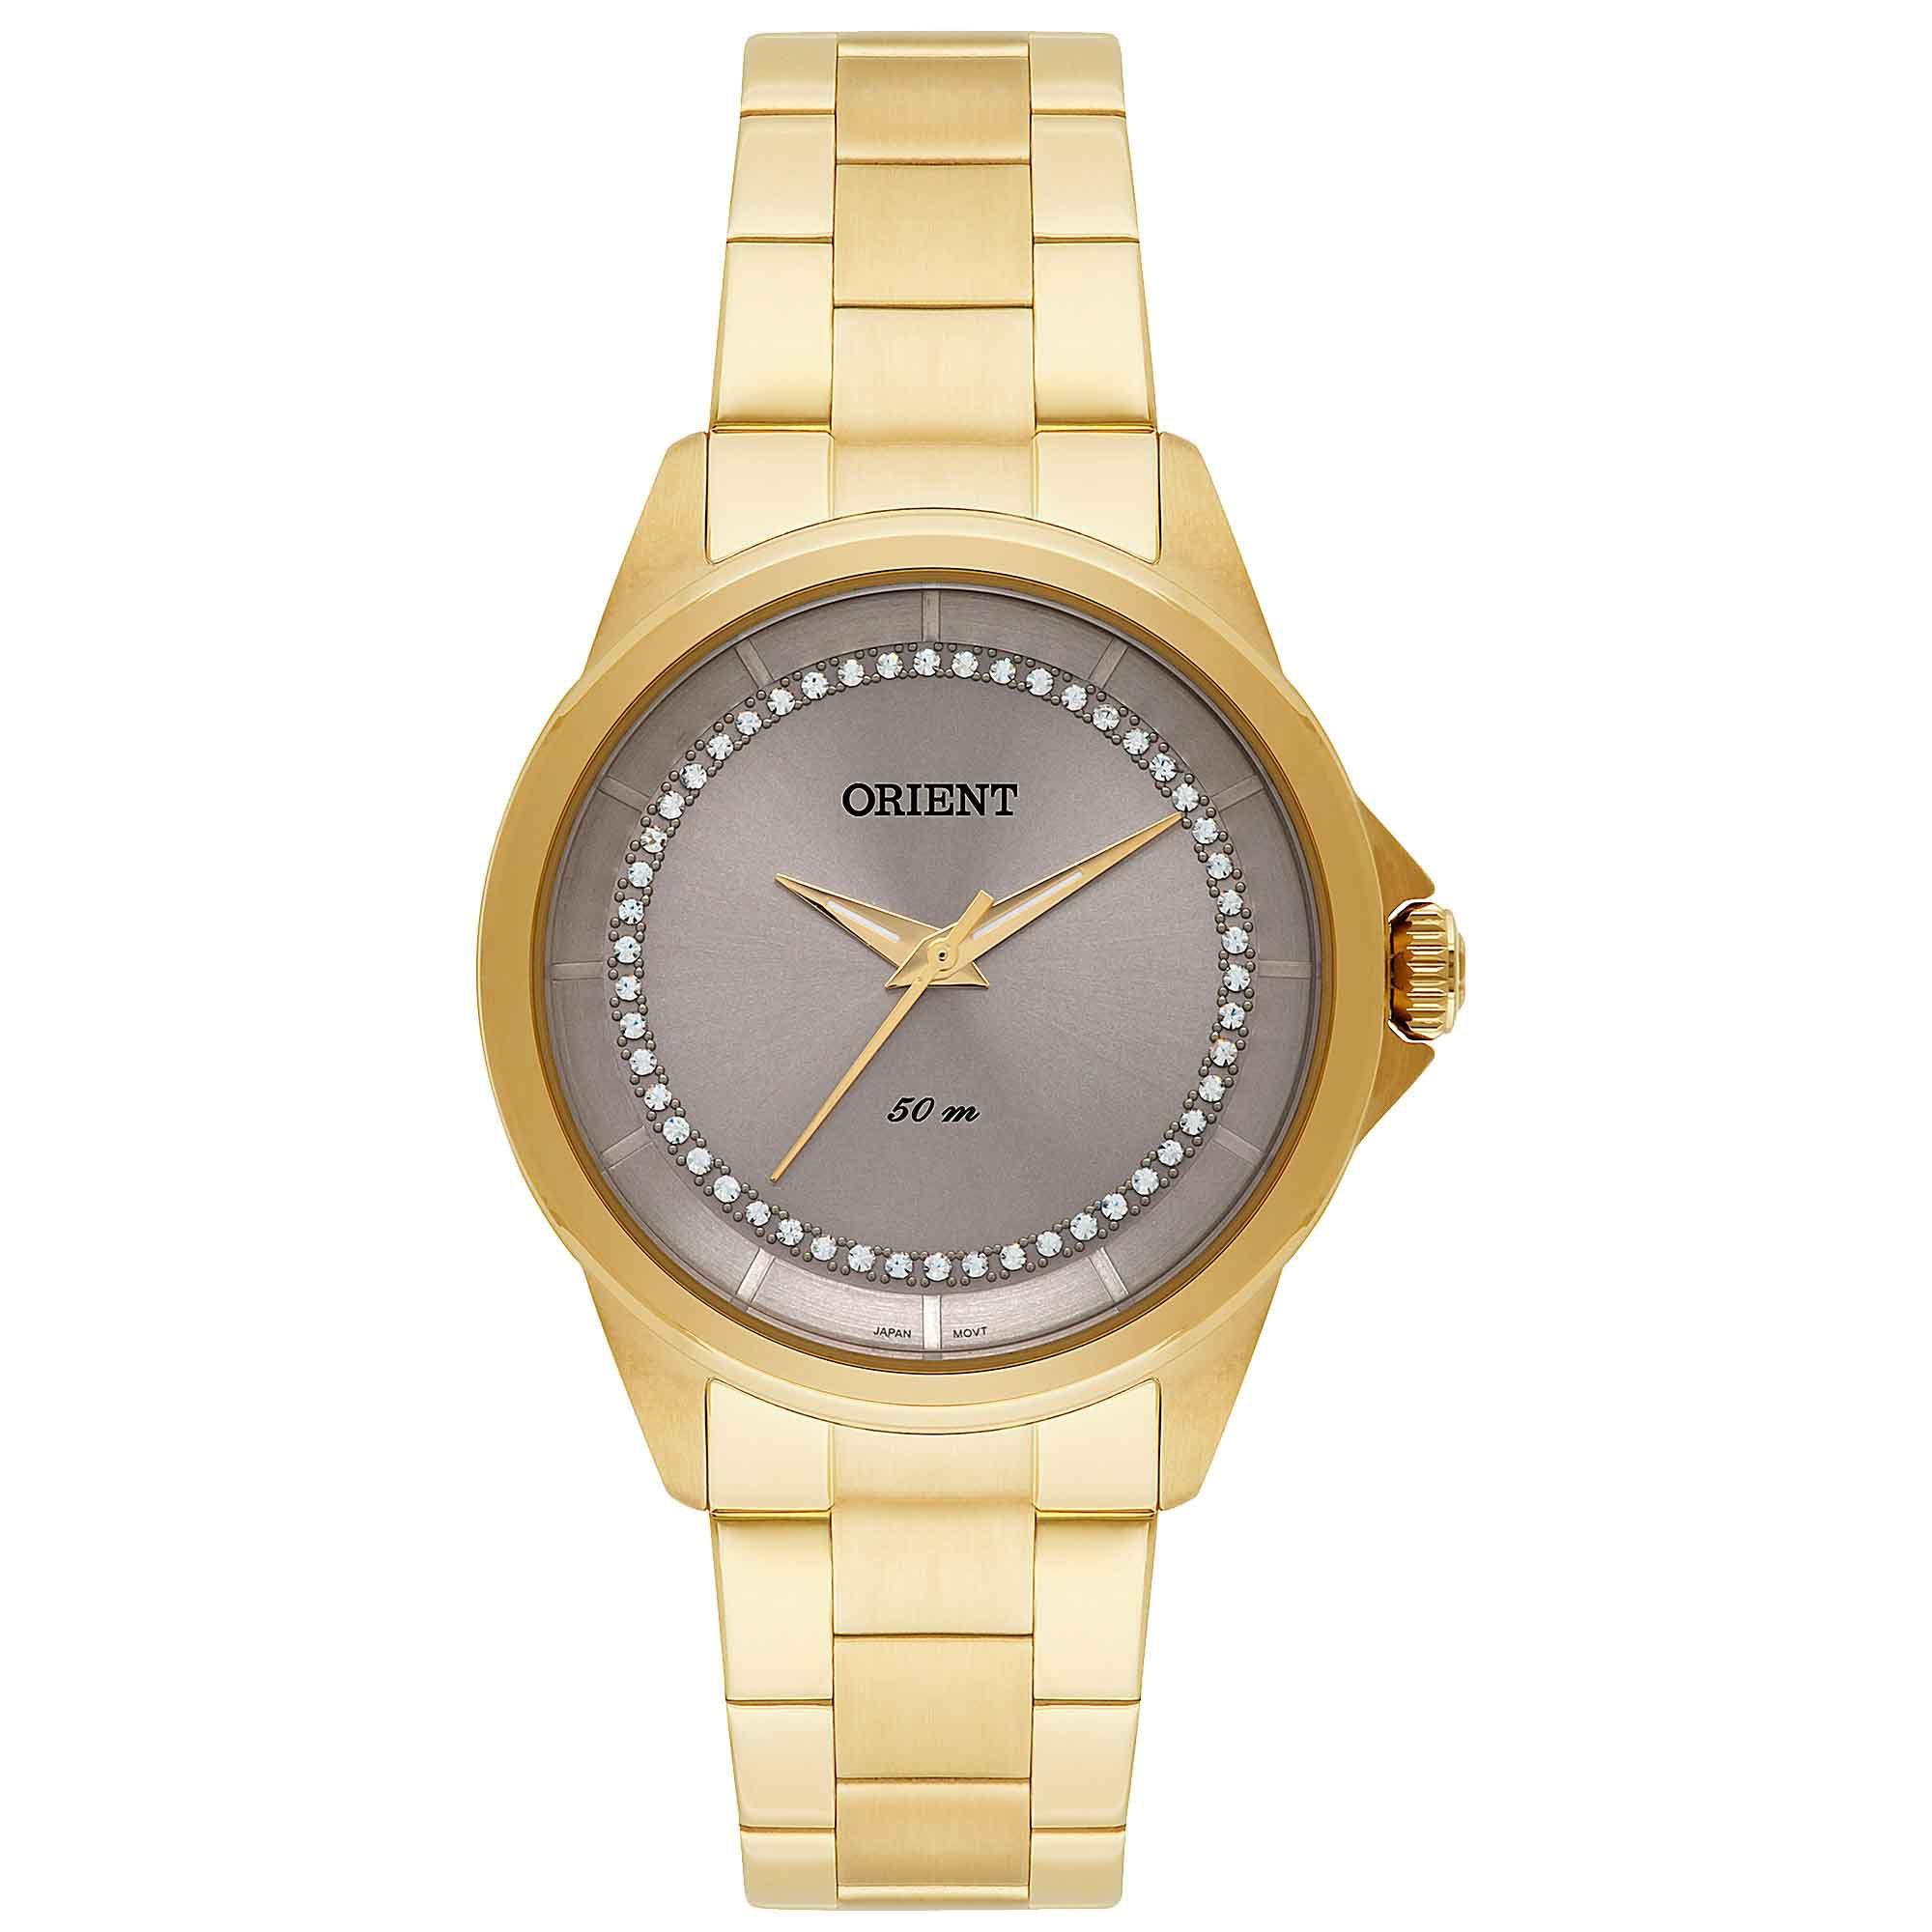 Relógio Feminino Orient FGSS0076 G1KX